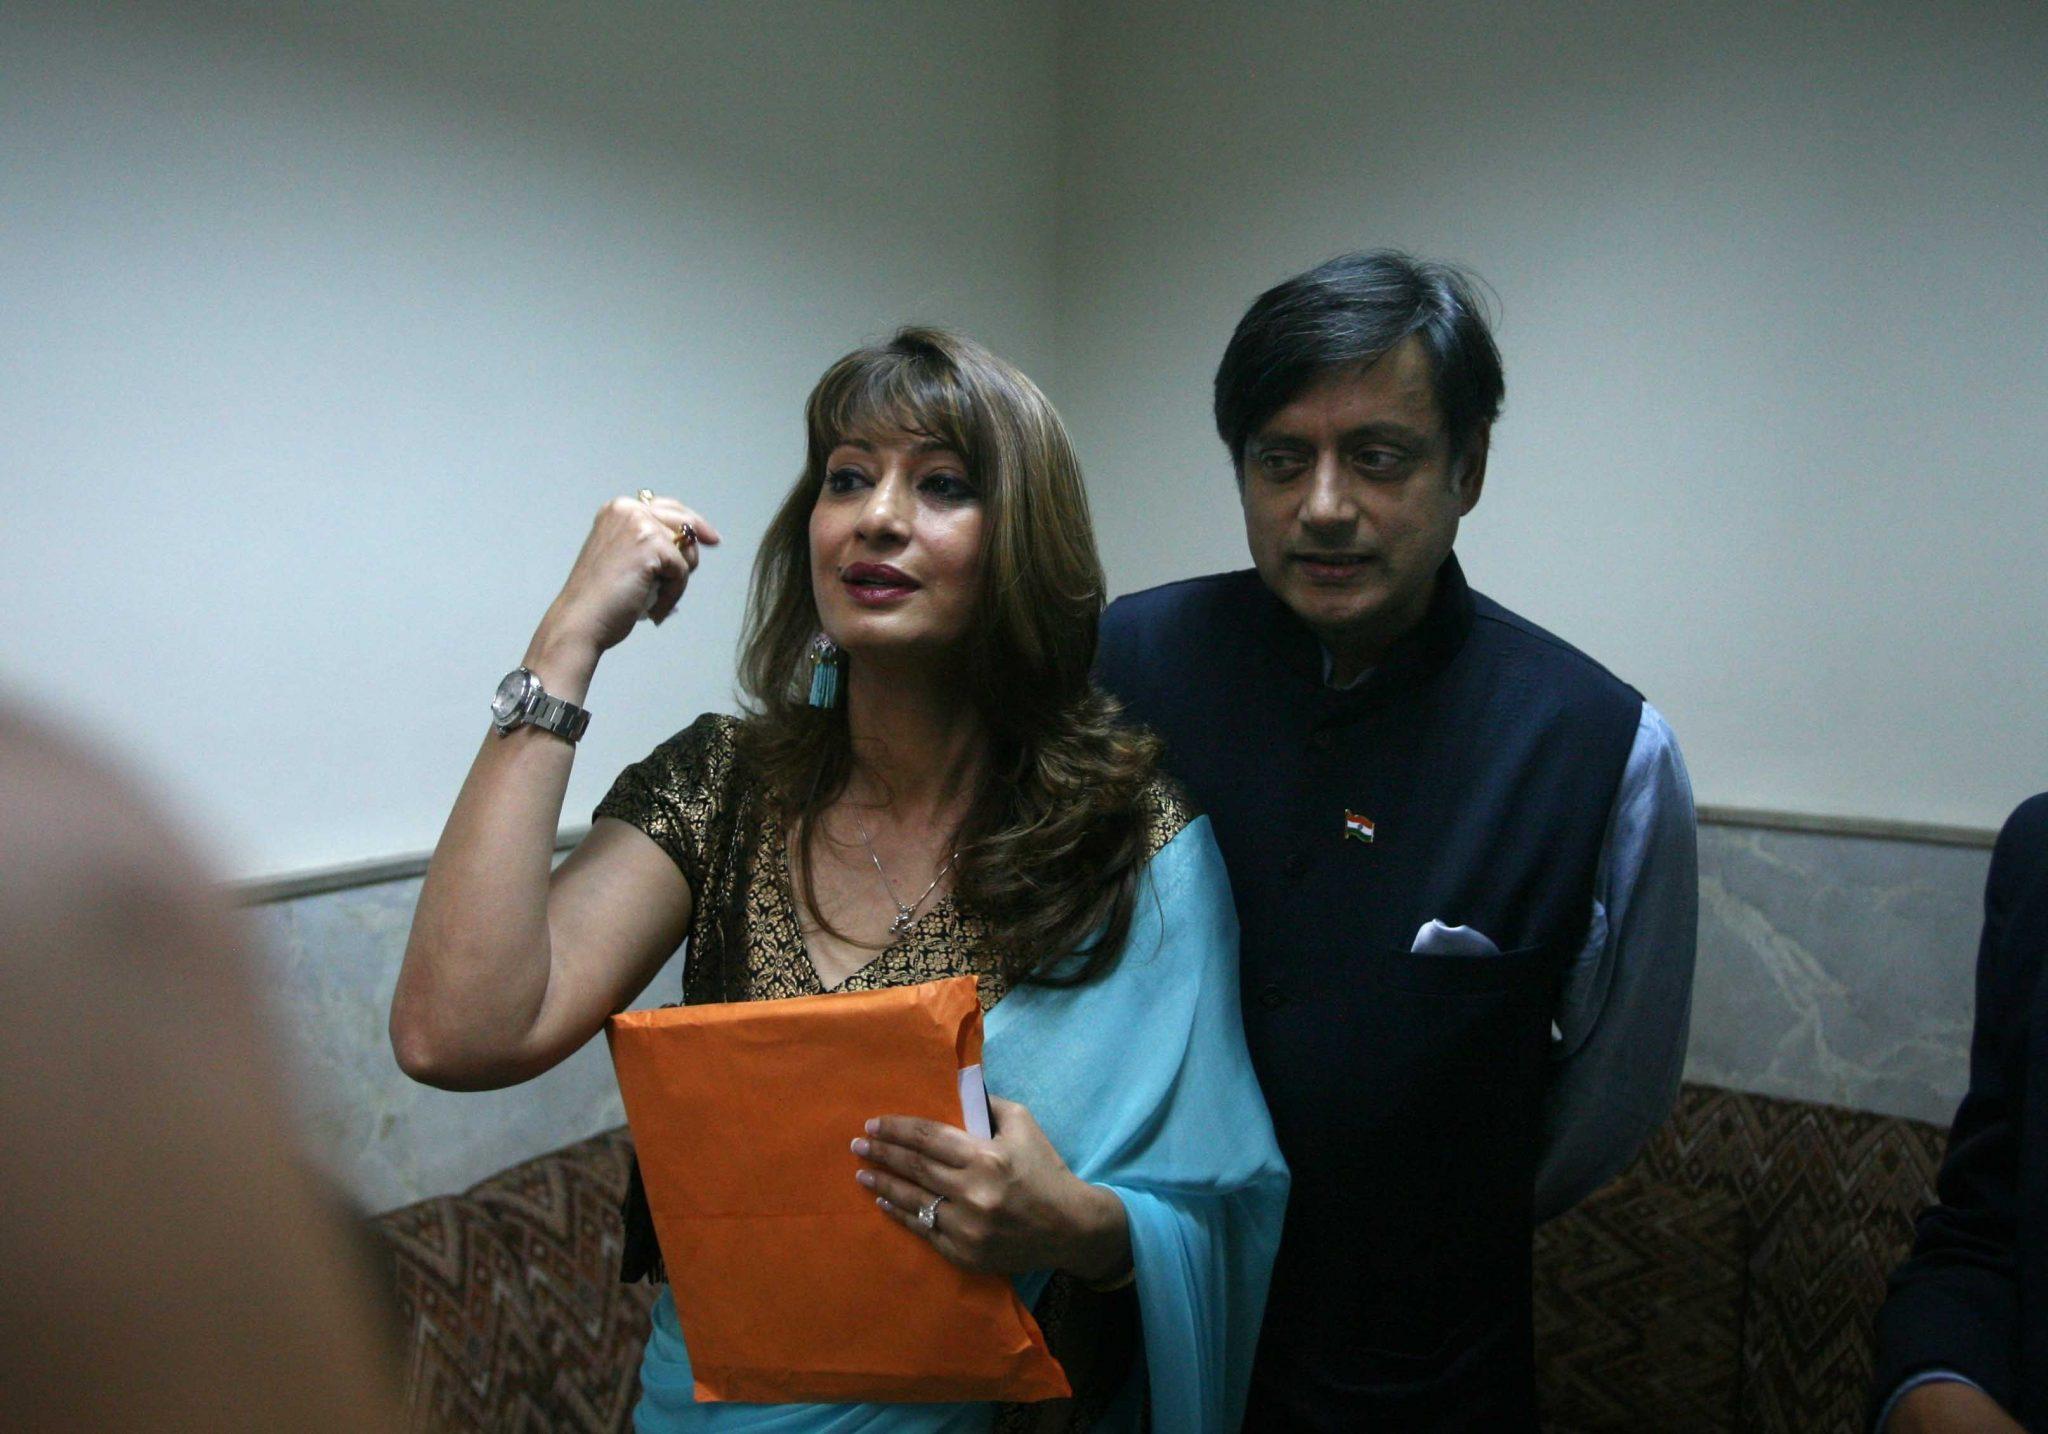 Sunanda Pushkar, Death, Probe, Shashi Tharoor, granted, anticipatory bail, Delhi Court, Newsmobile, Mobile News, Delhi Police,India, Politics, India